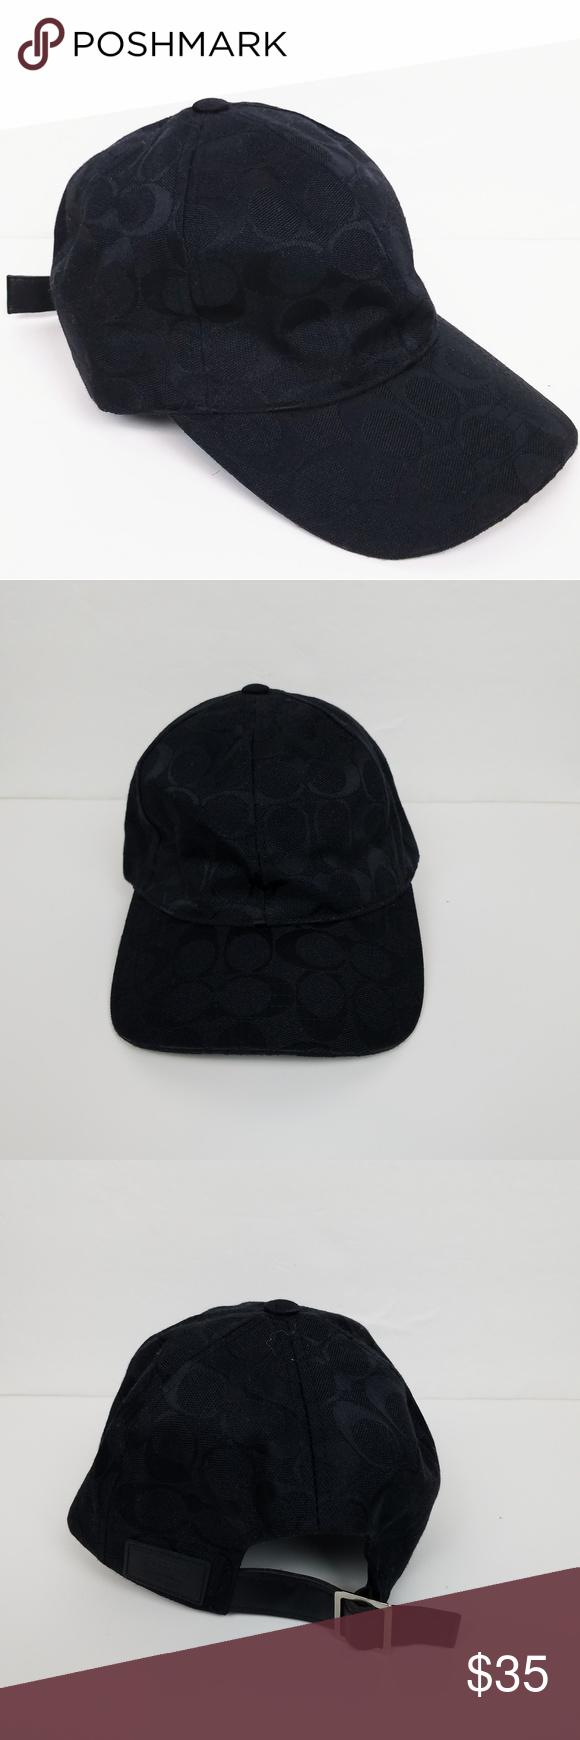 Coach Signature Black Hat Cap Black baseball cap with adjustable strap.  Signature logo throughout. Brand new. Never worn. Excellent condition. c05223fa26e